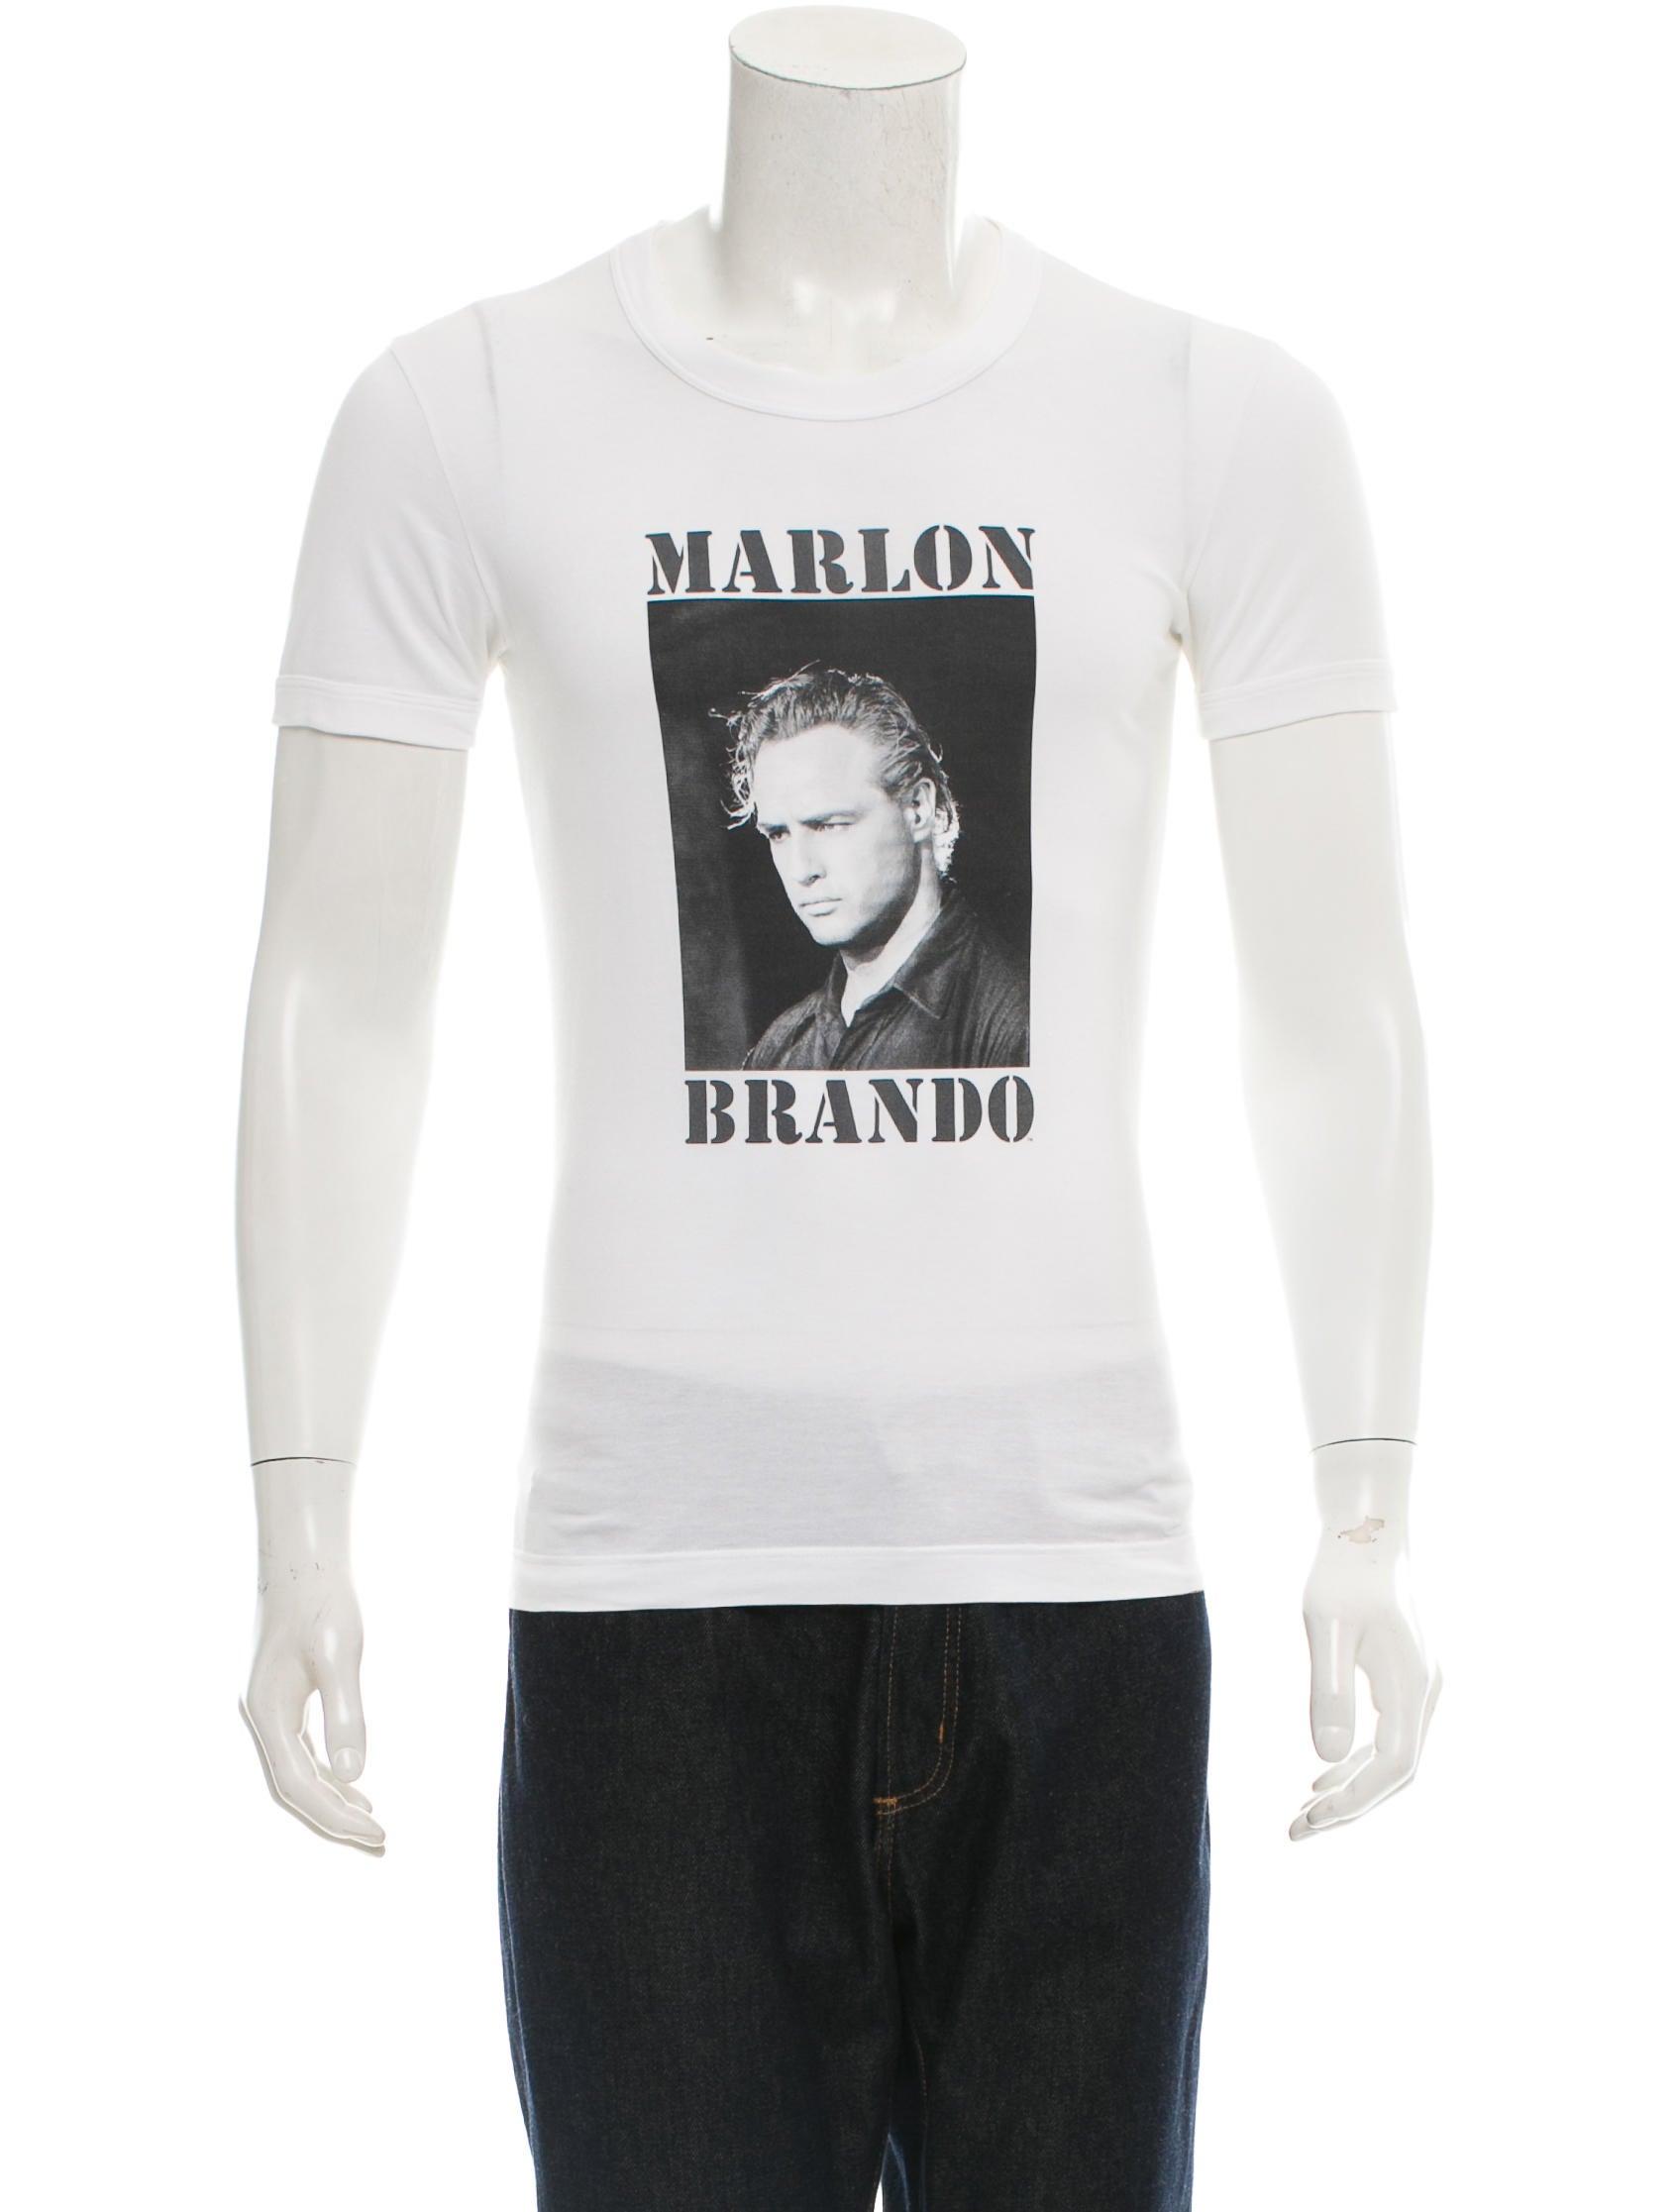 dolce gabbana marlon brando graphic t shirt clothing. Black Bedroom Furniture Sets. Home Design Ideas